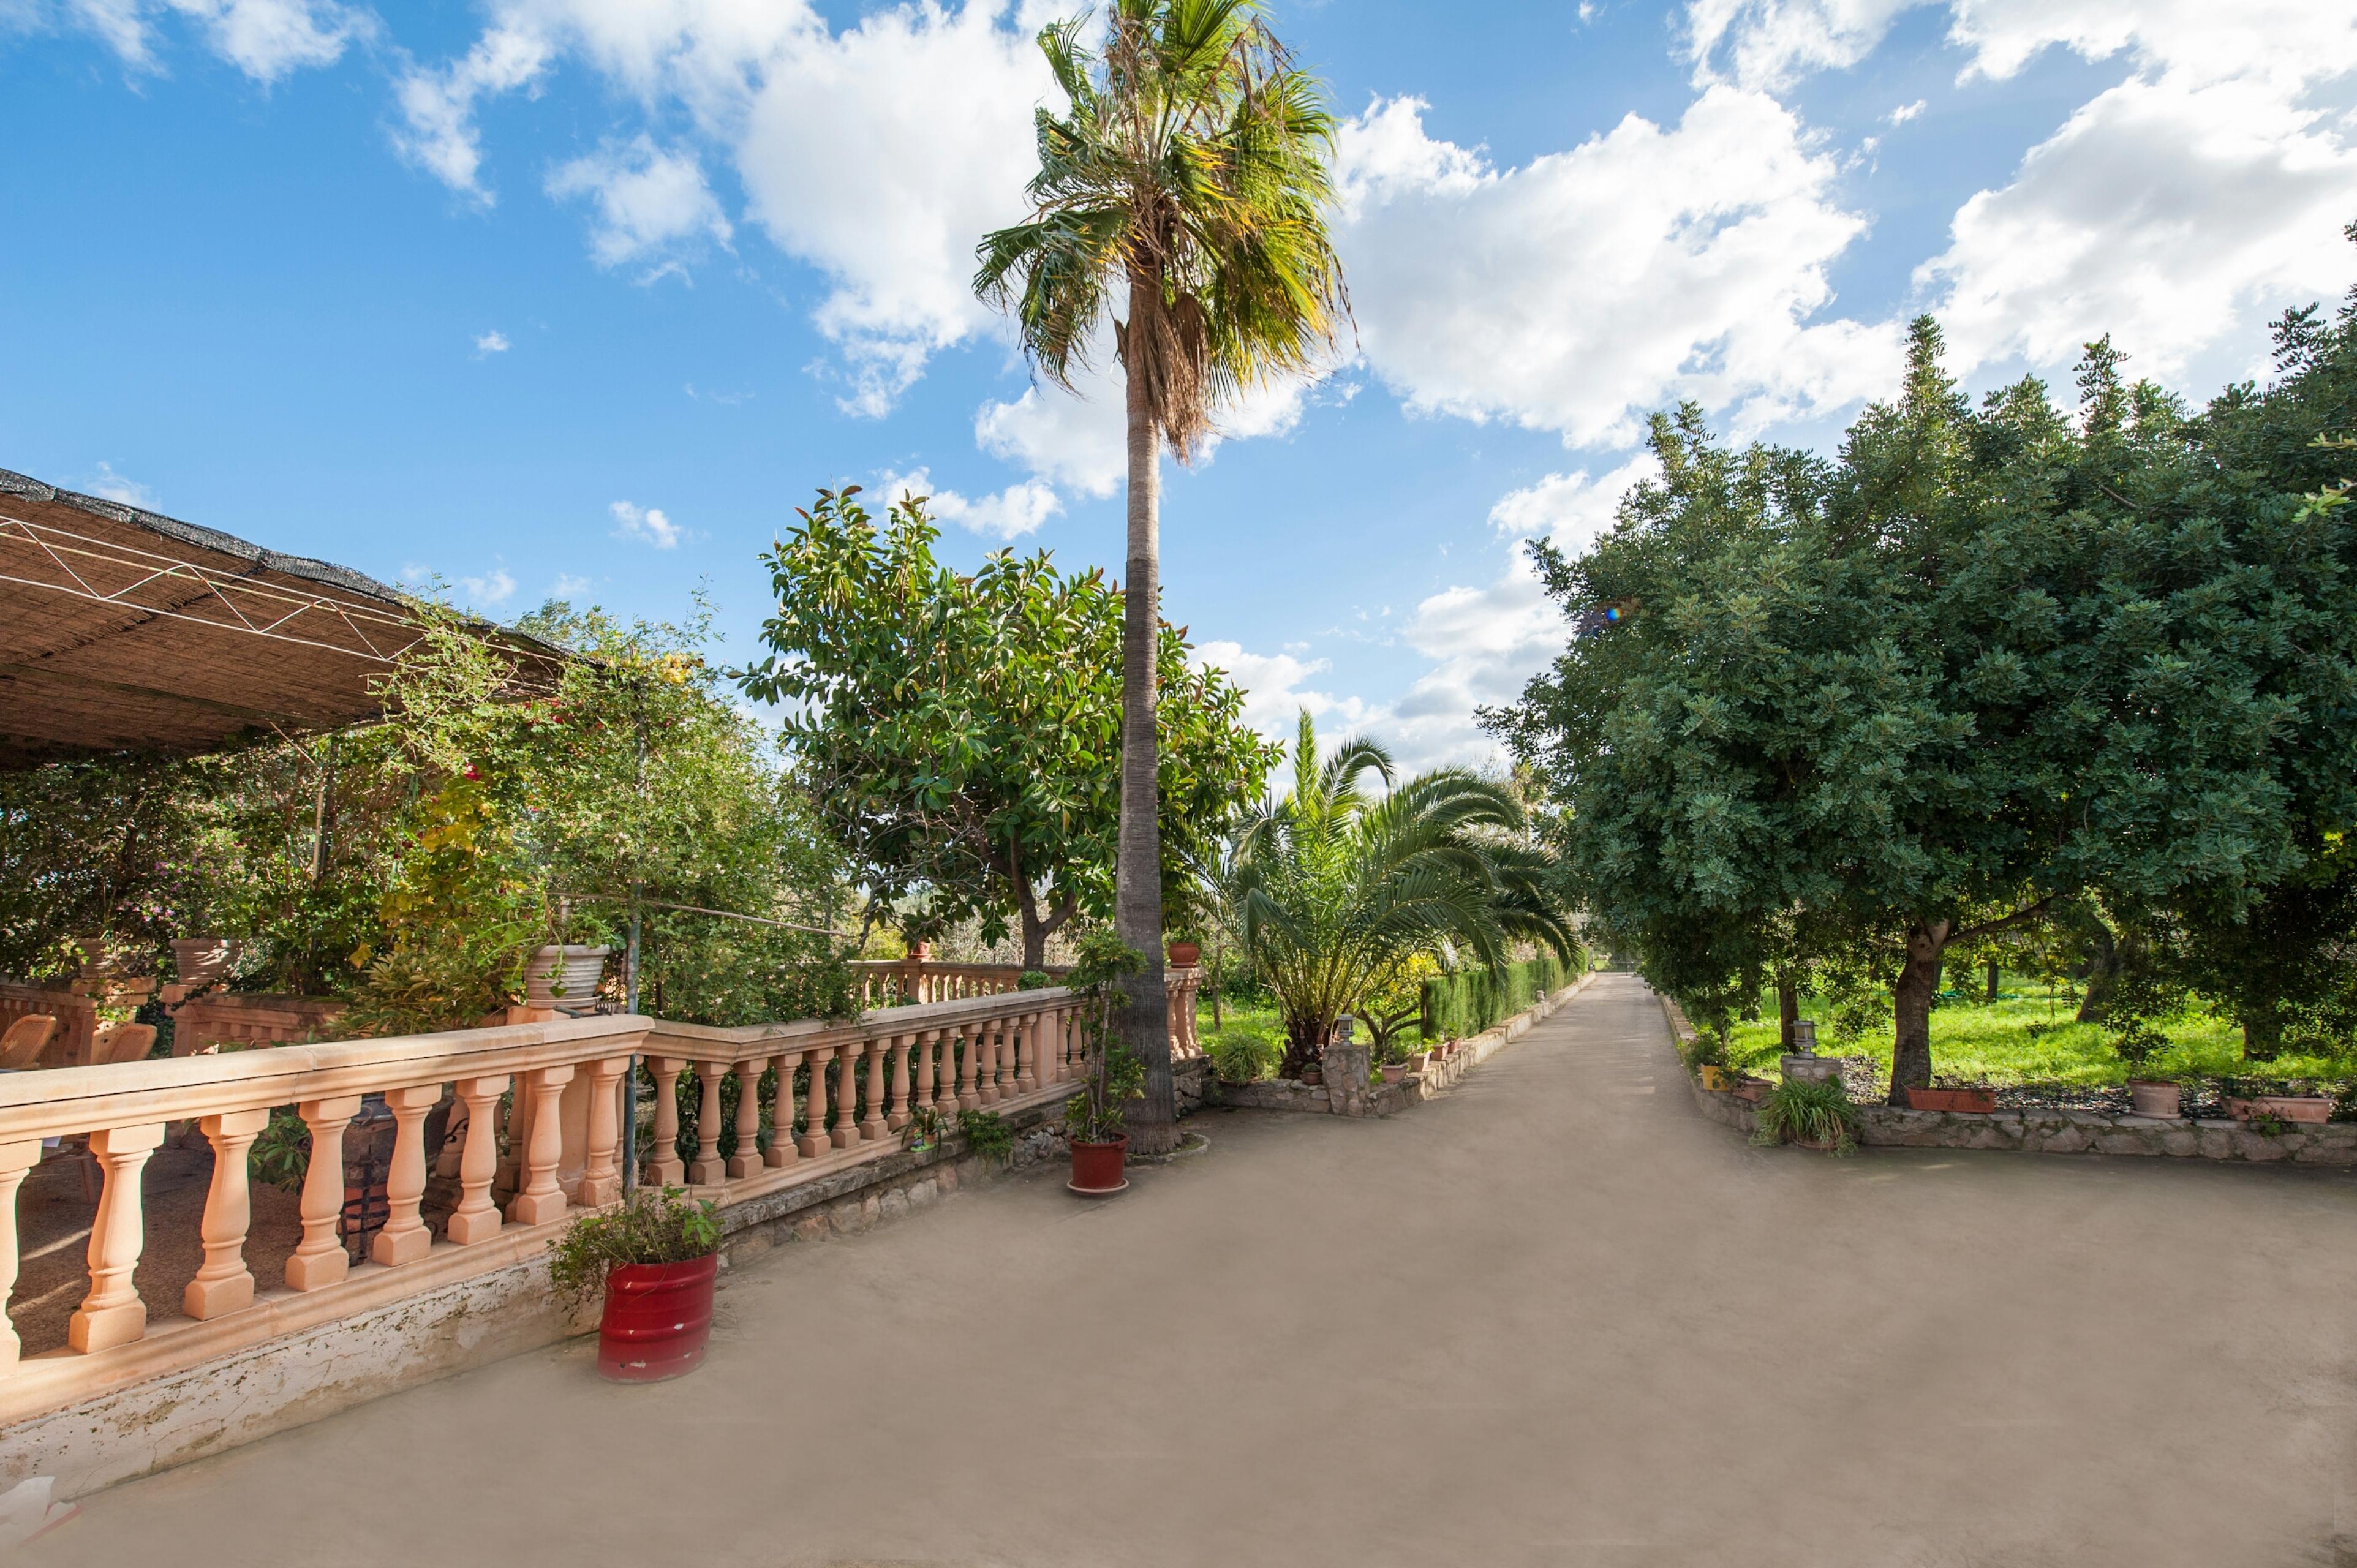 Maison de vacances CA'N LLUC- Alaró- MALLORCA - Kostenloses WLAN (2687507), Alaro, Majorque, Iles Baléares, Espagne, image 13